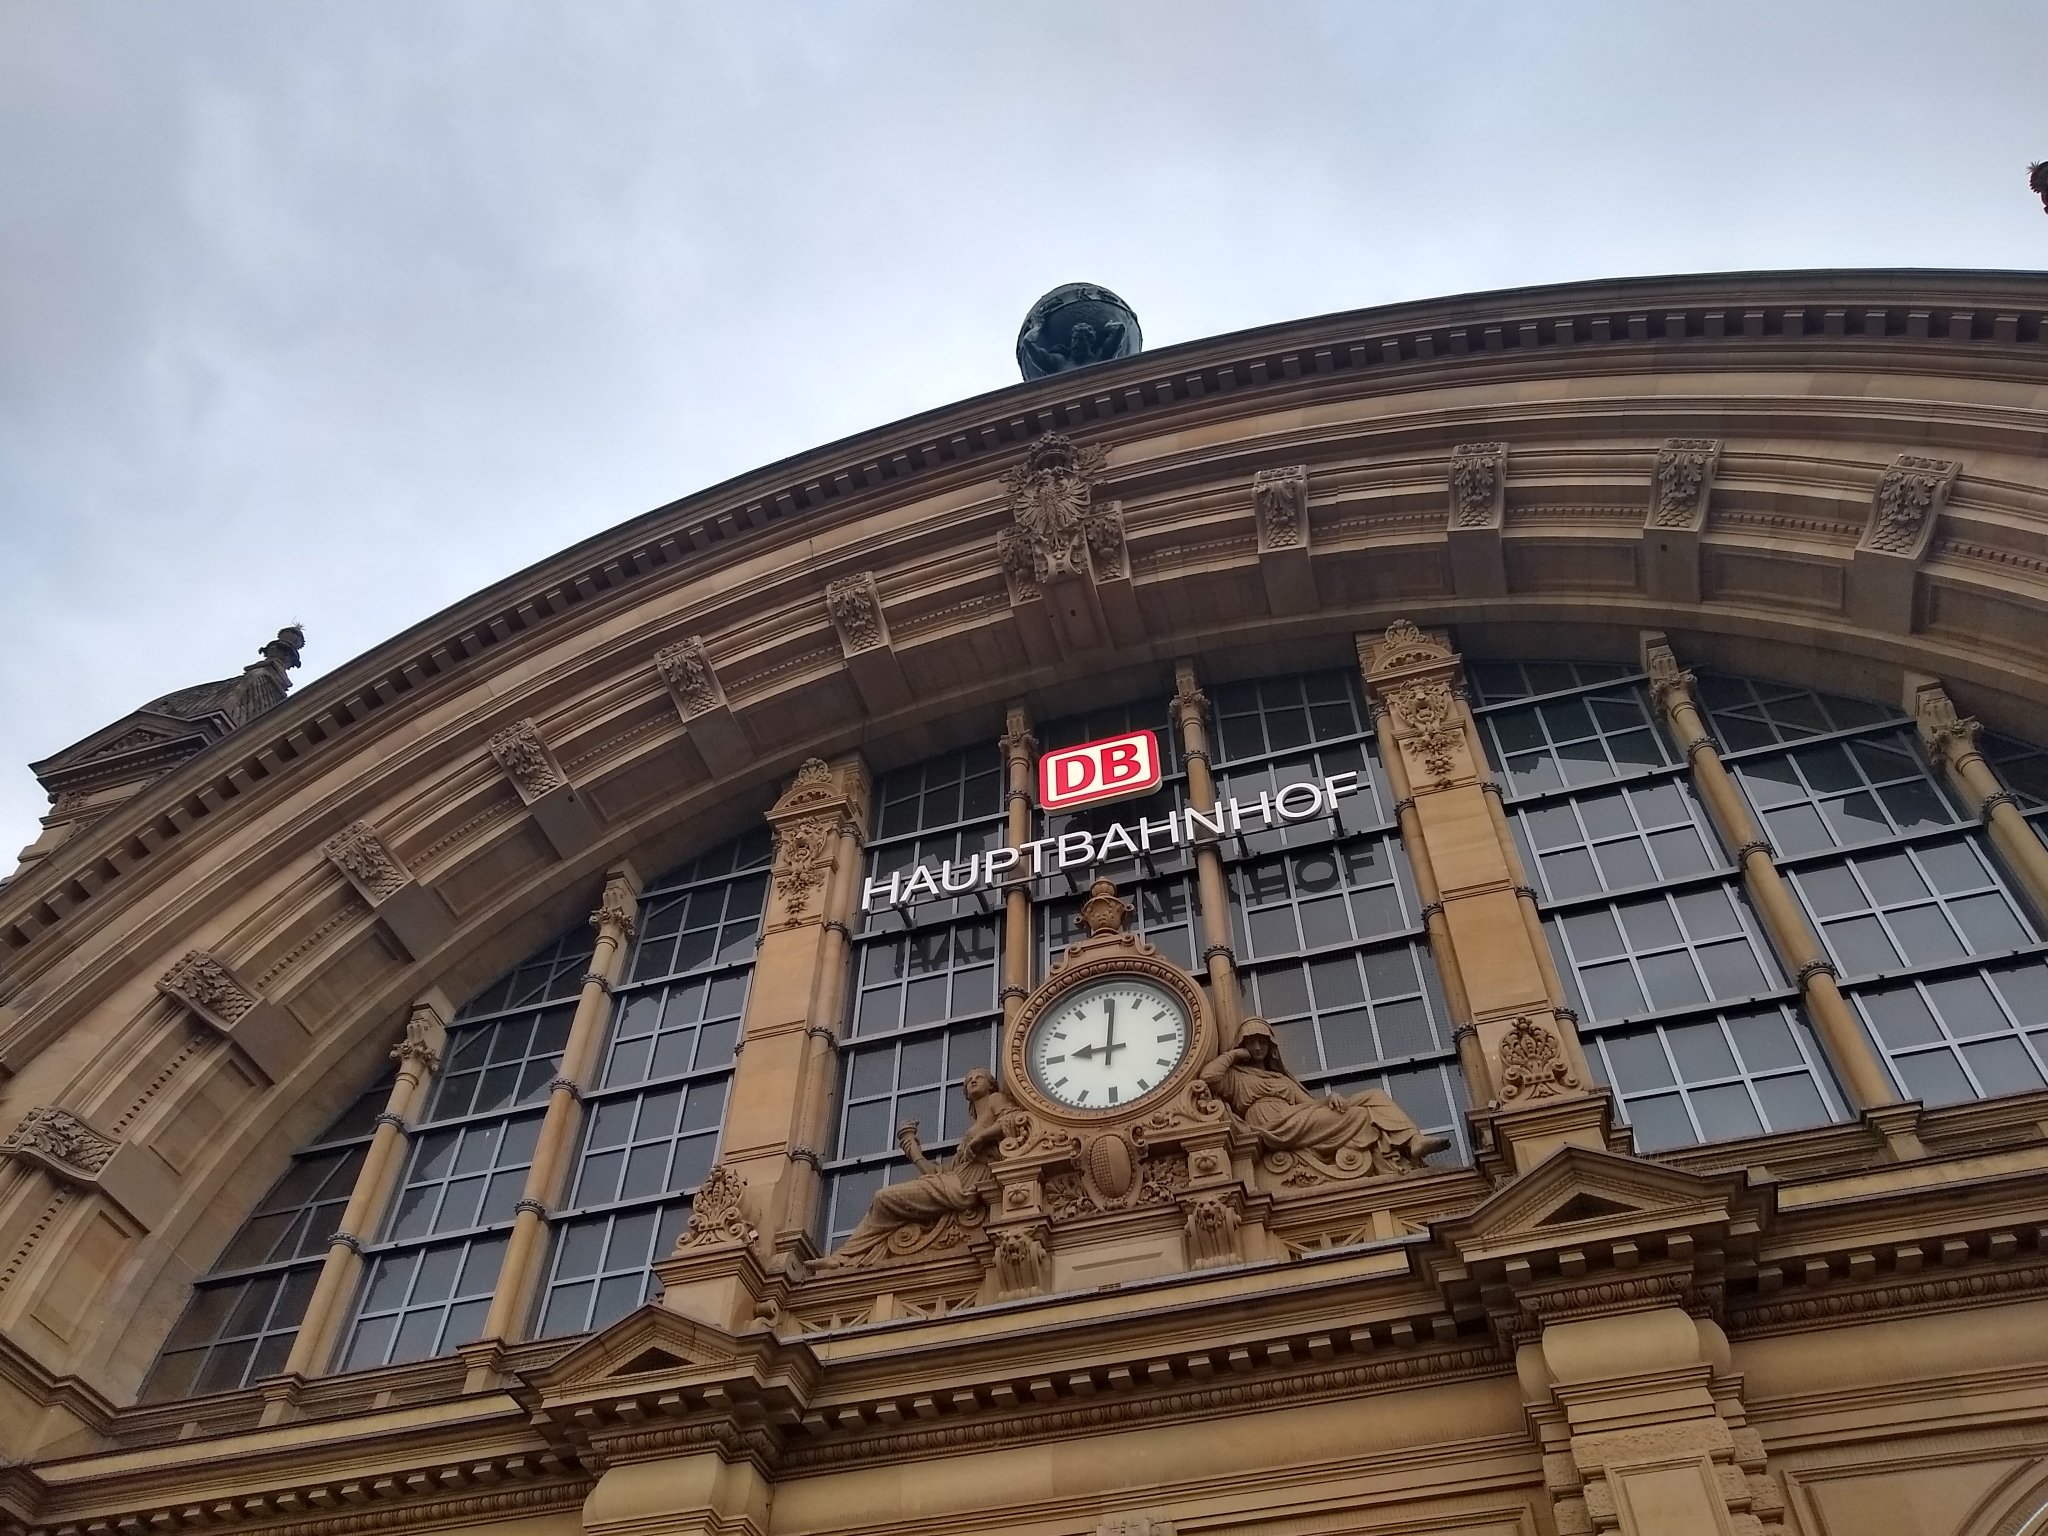 Frankfurt Hbf building in the morning